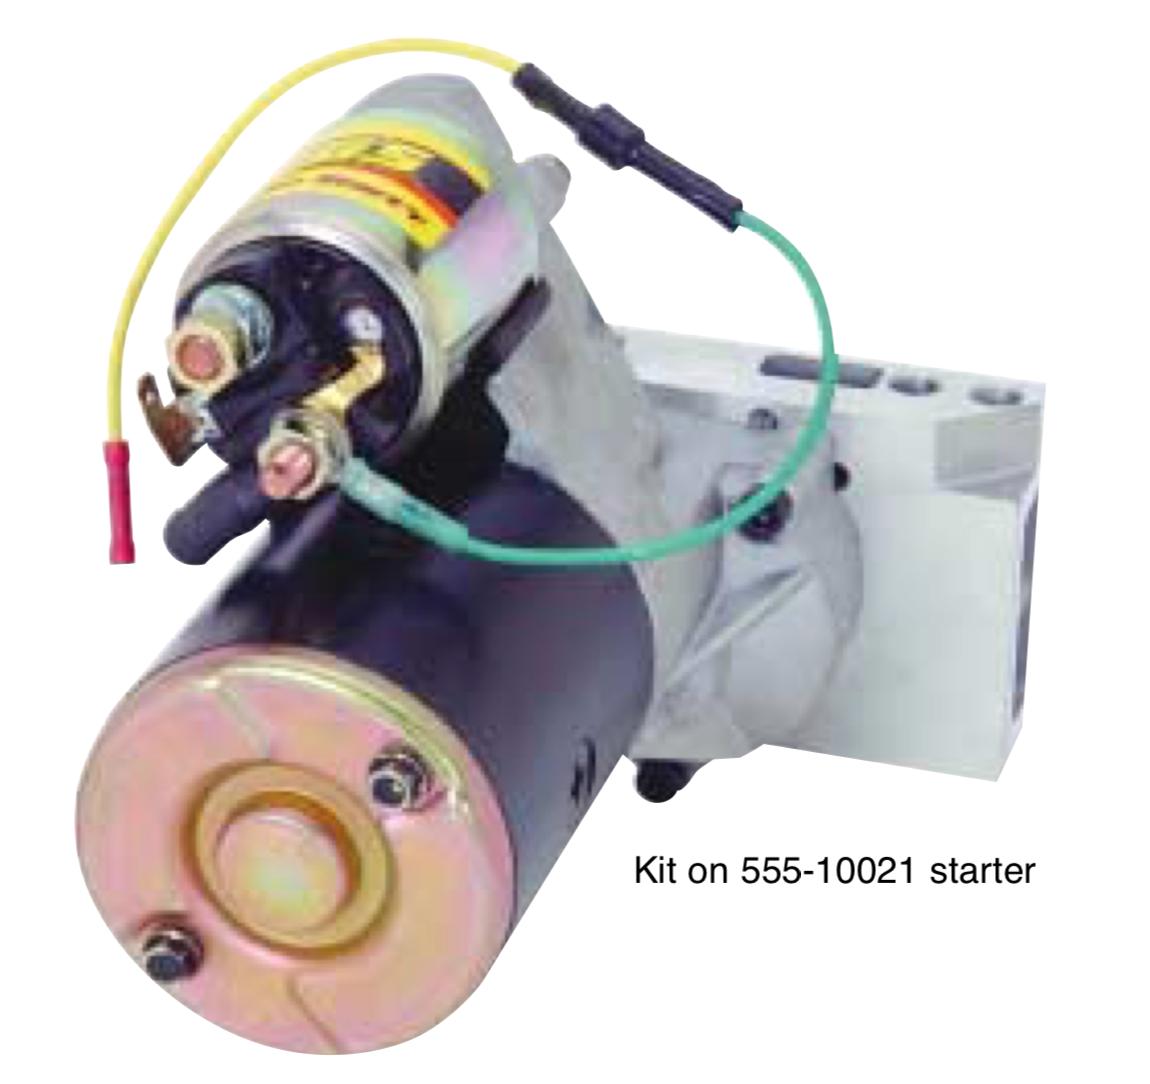 555-10038 R Terminal Diode Kid installed on 555-10021 starter